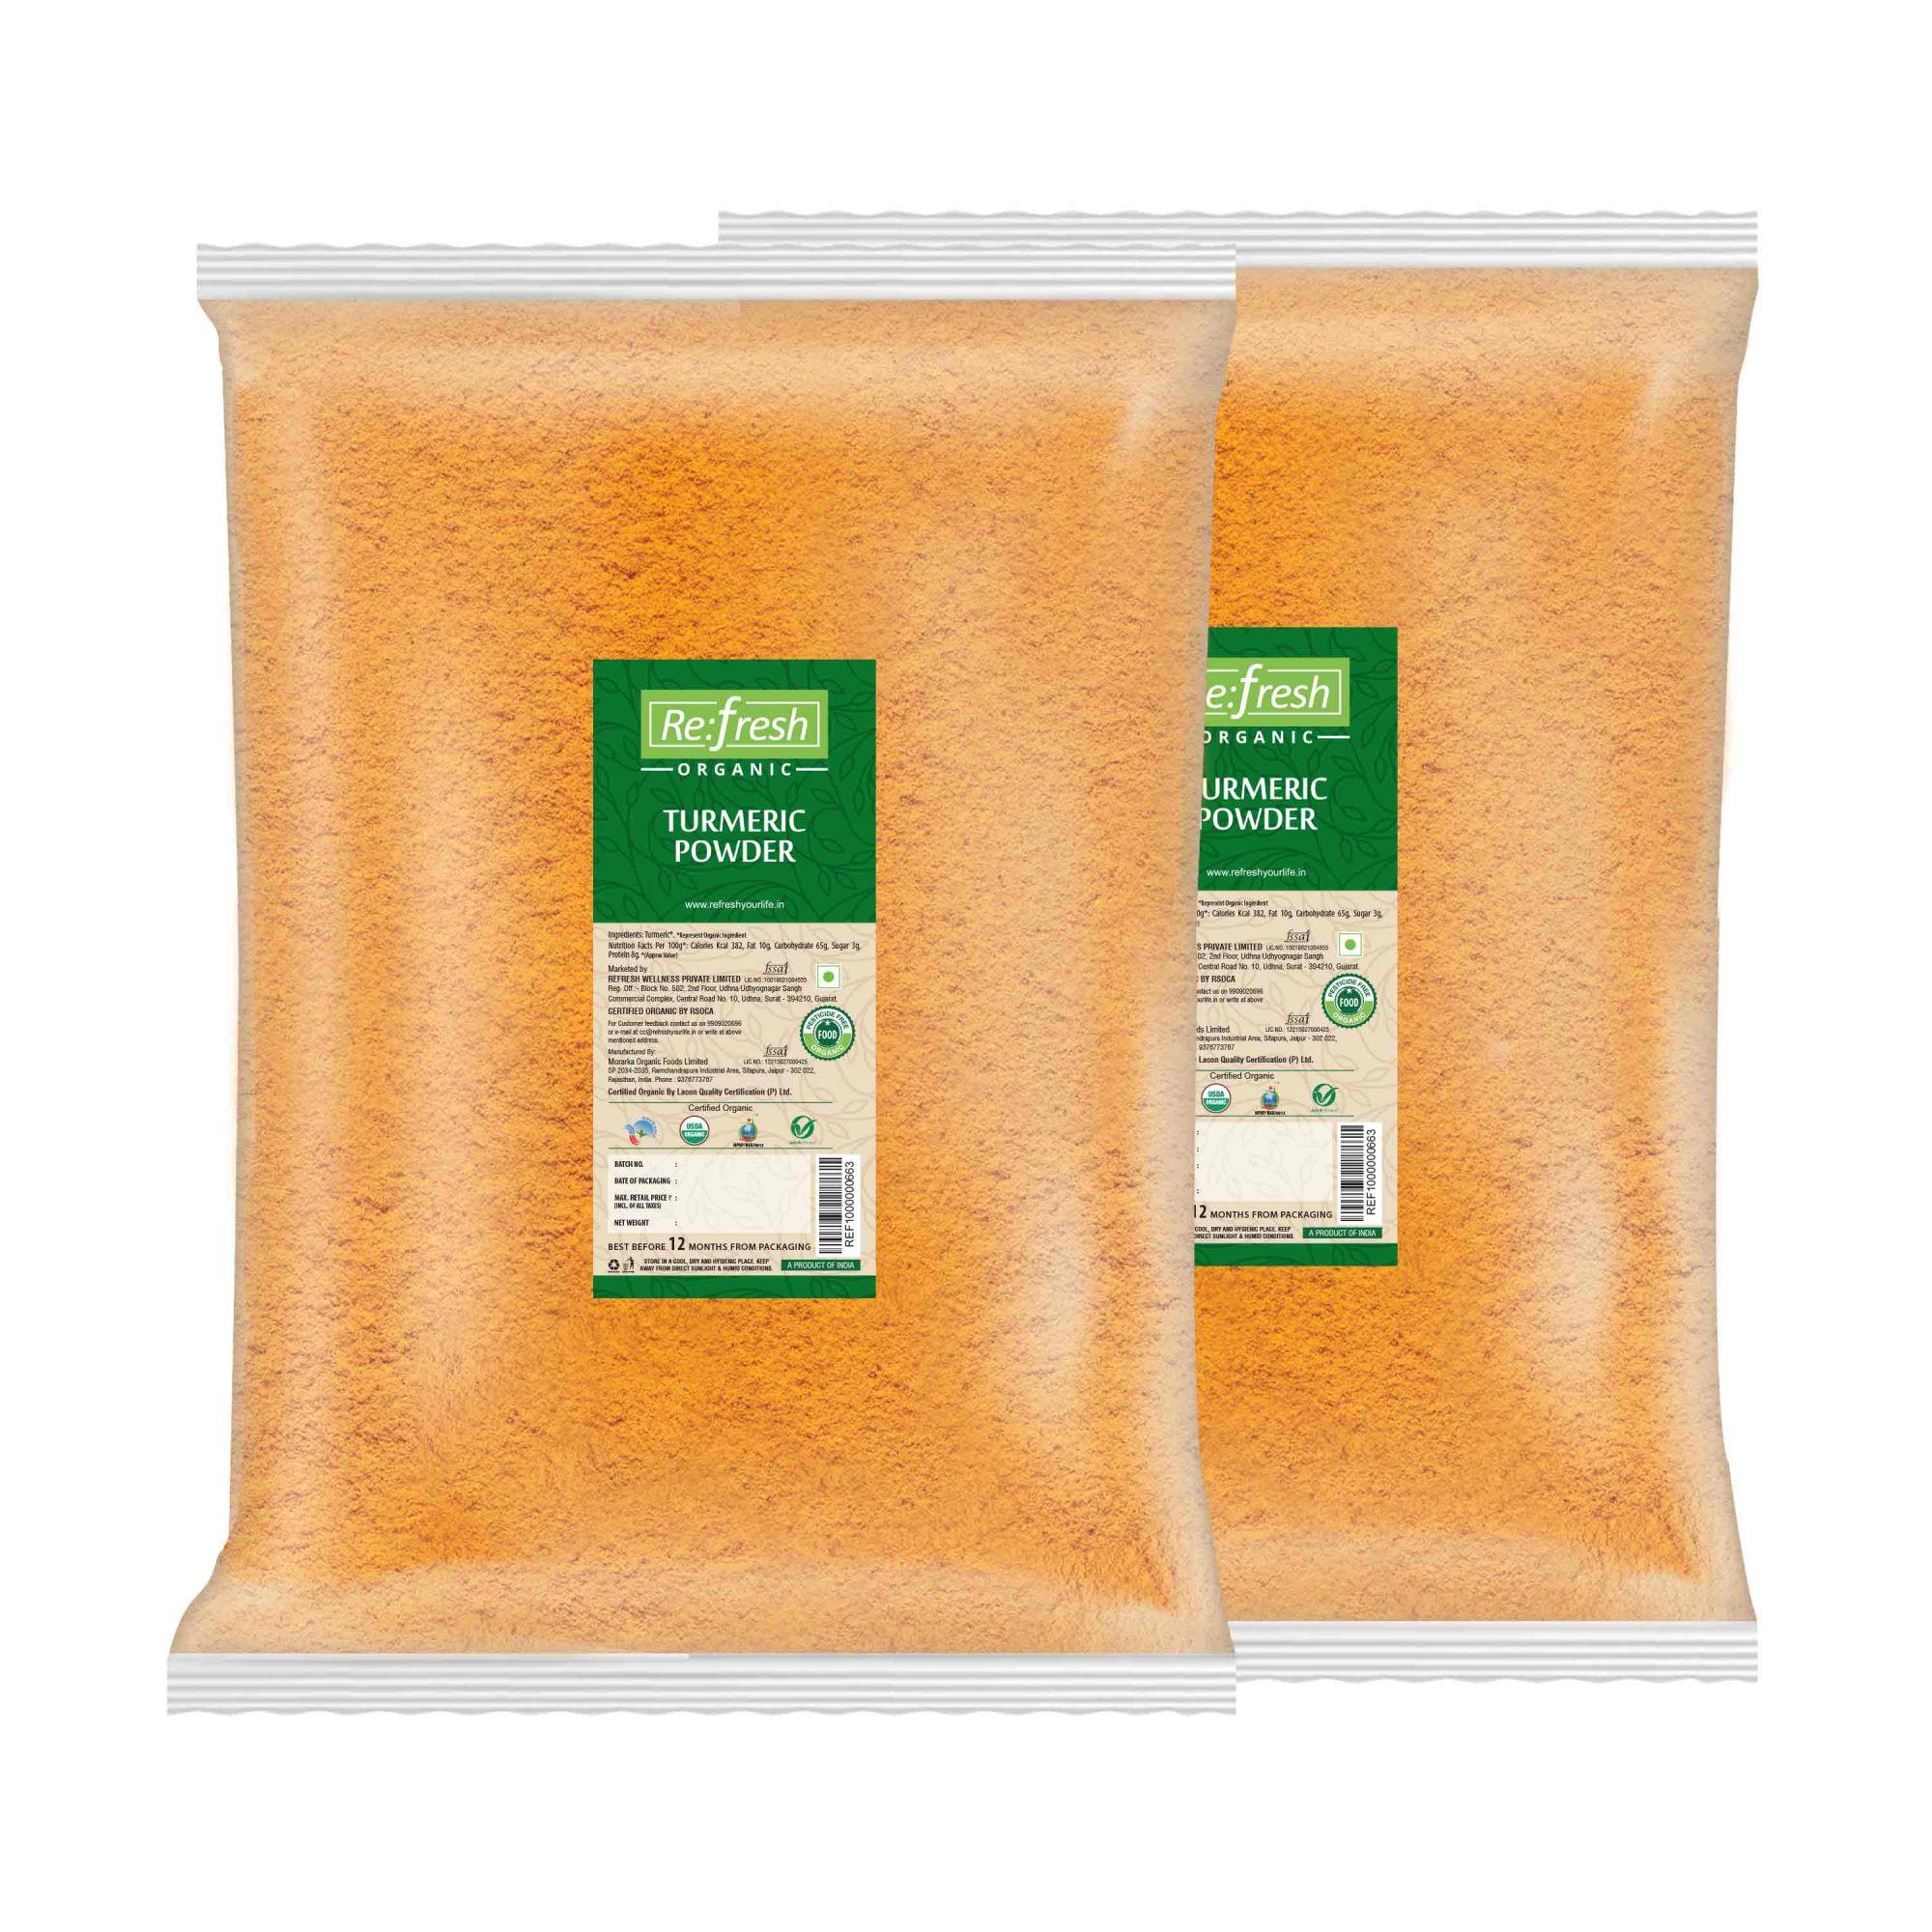 Organic Turmeric Powder - 2 KG